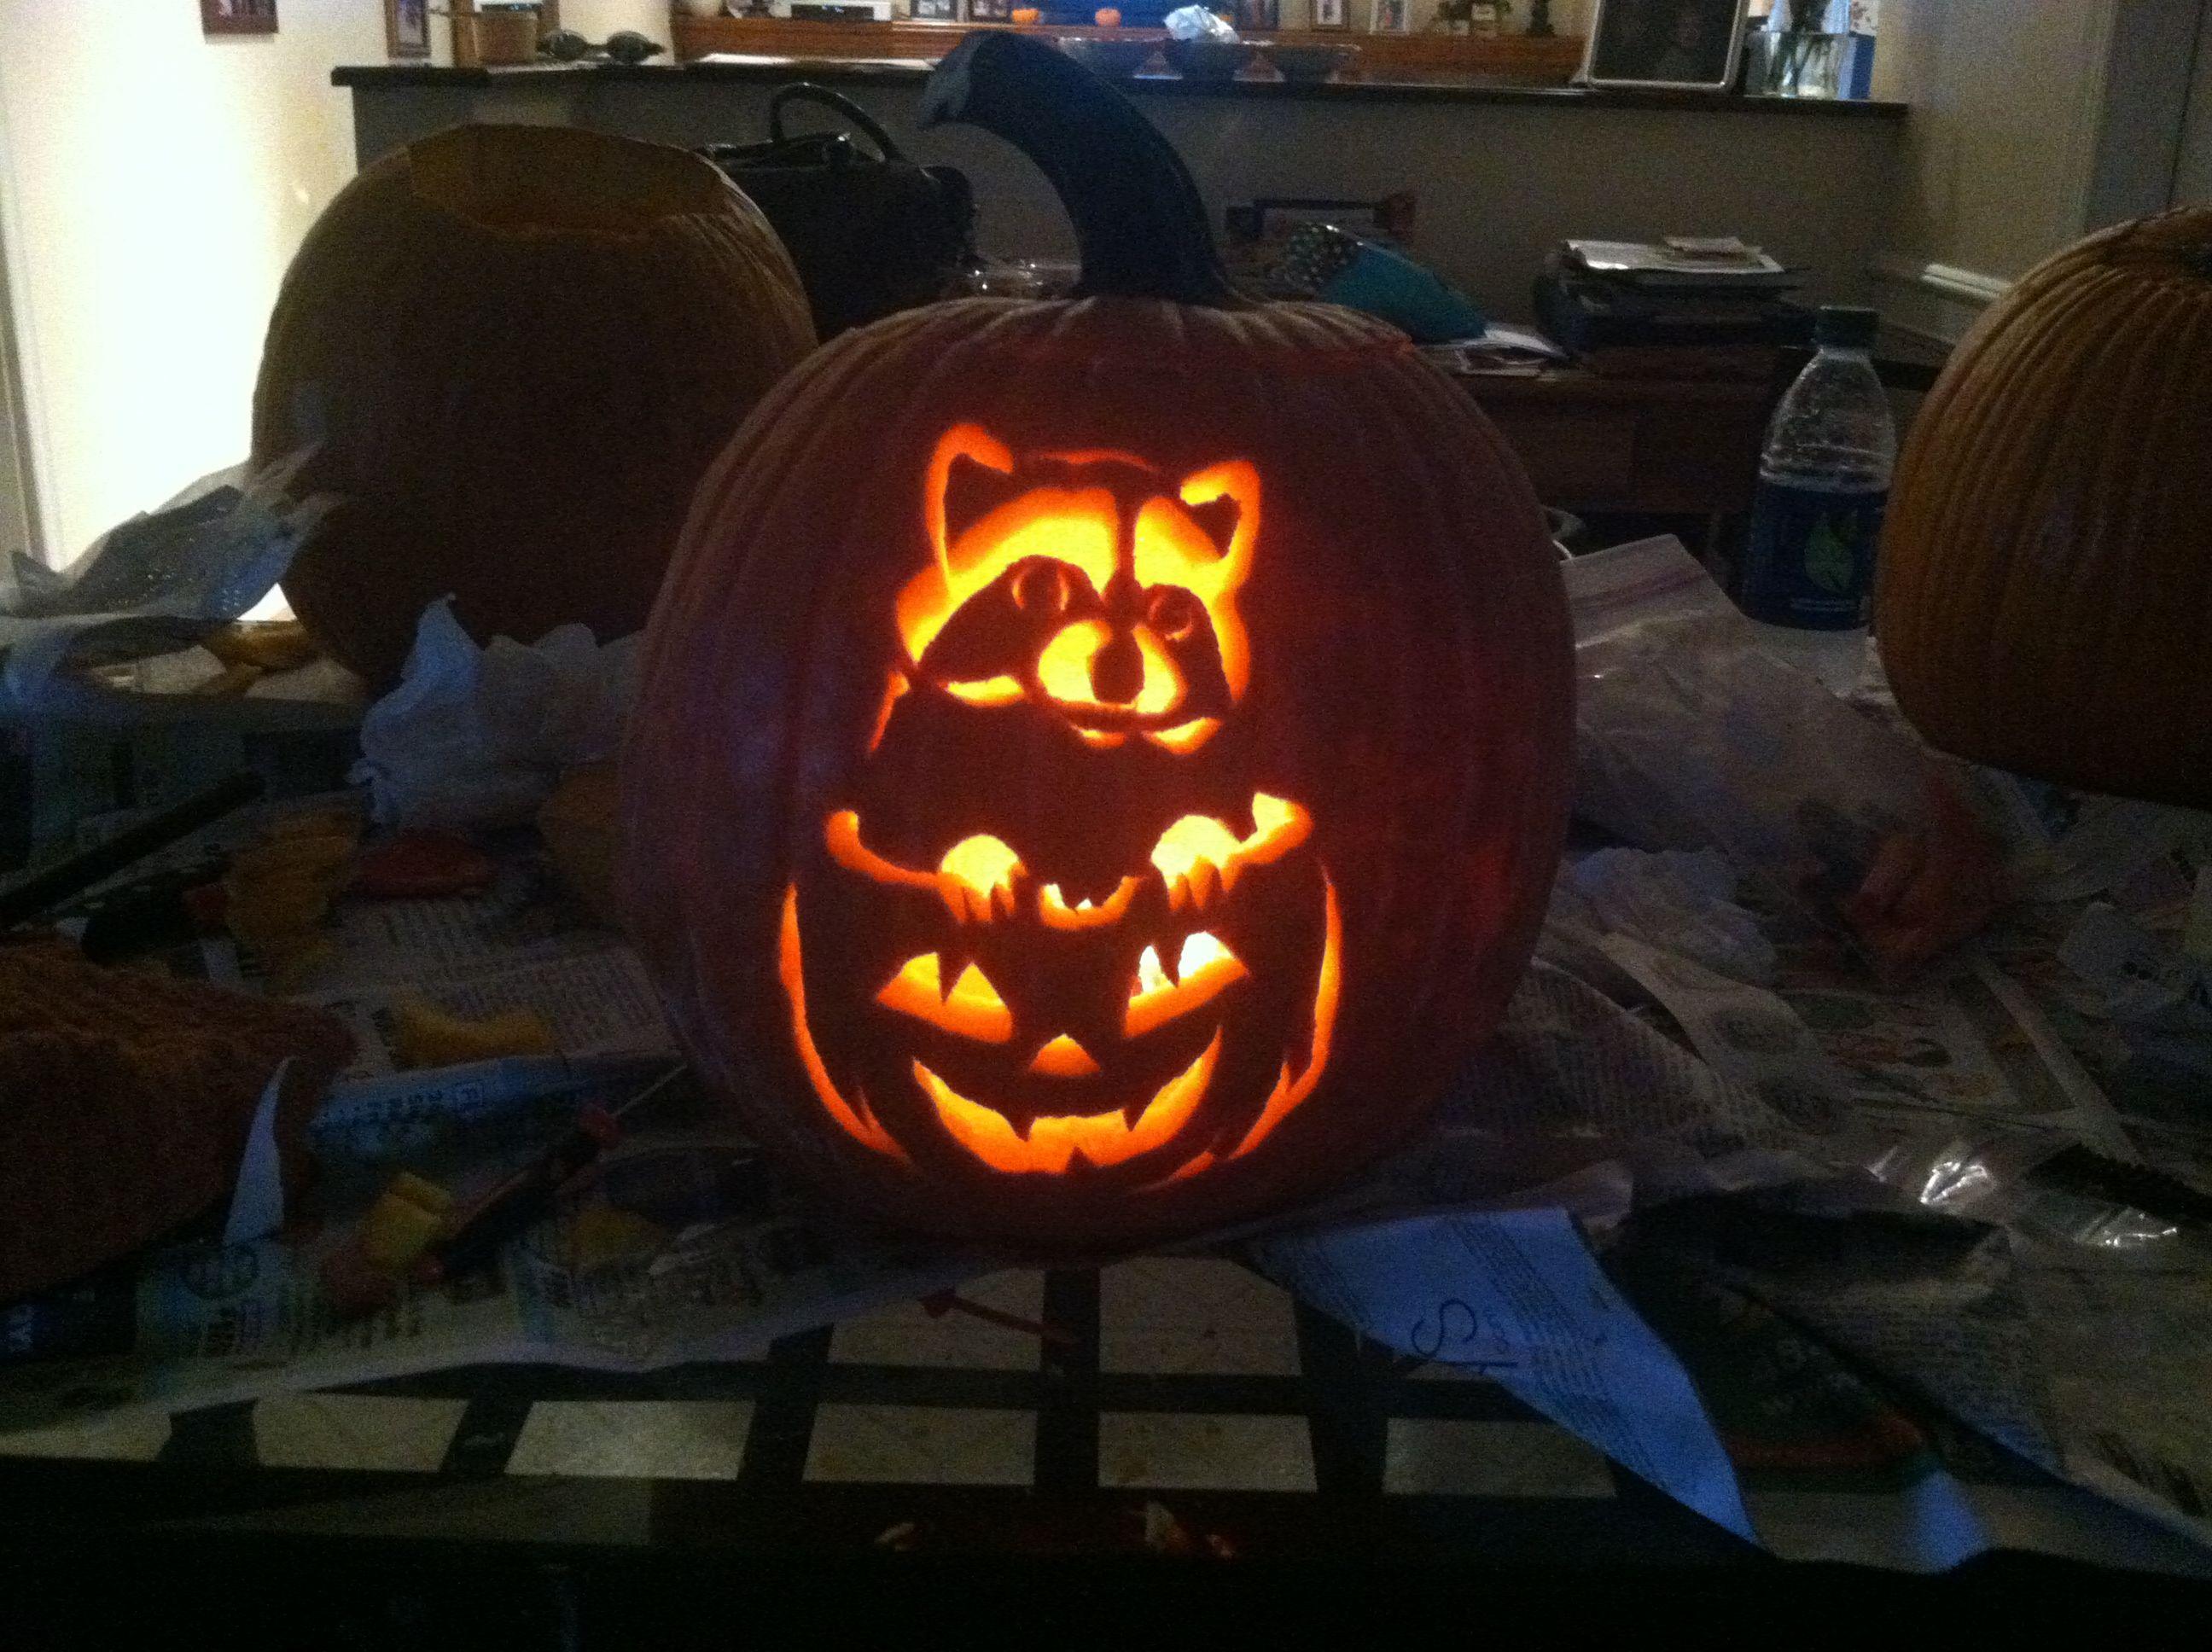 Pumpkin carving raccoon in a little bit of